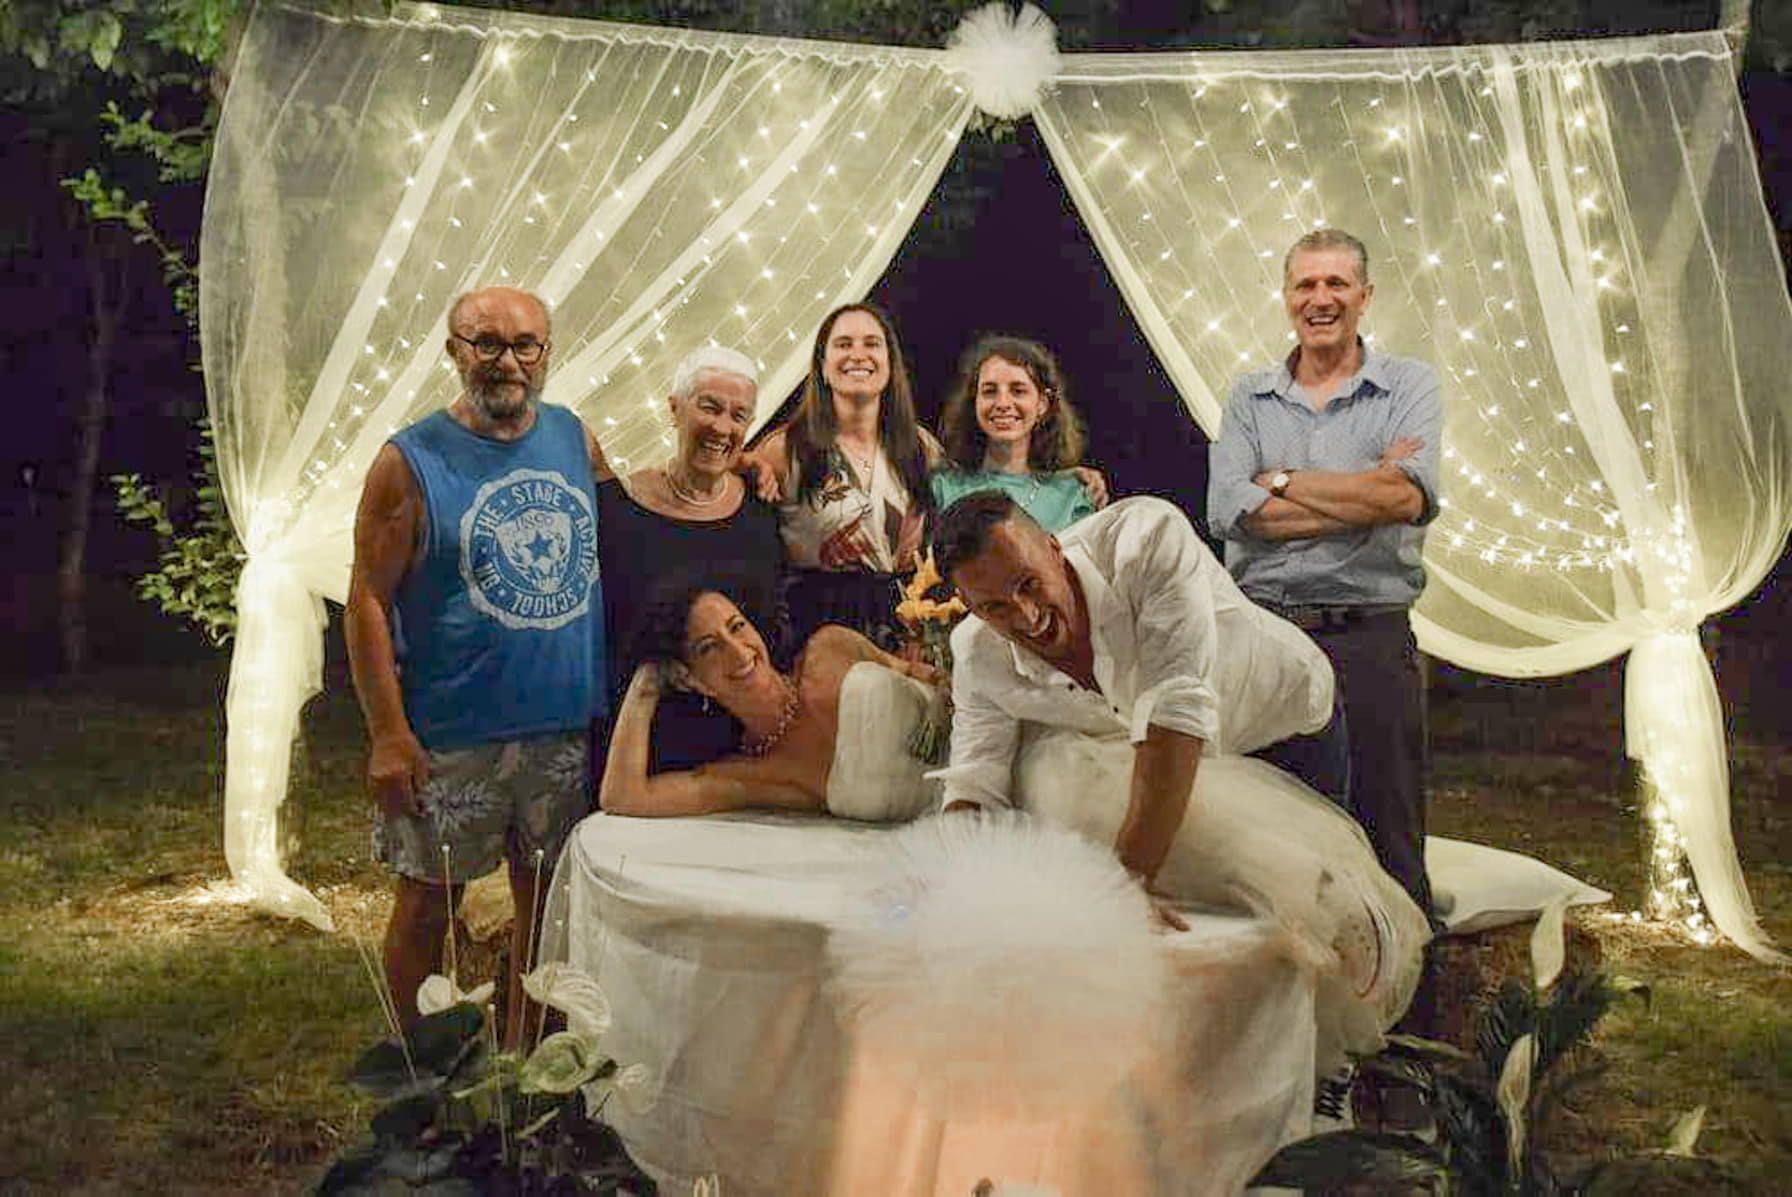 tavolo sposi matrimonio semplice in giardino